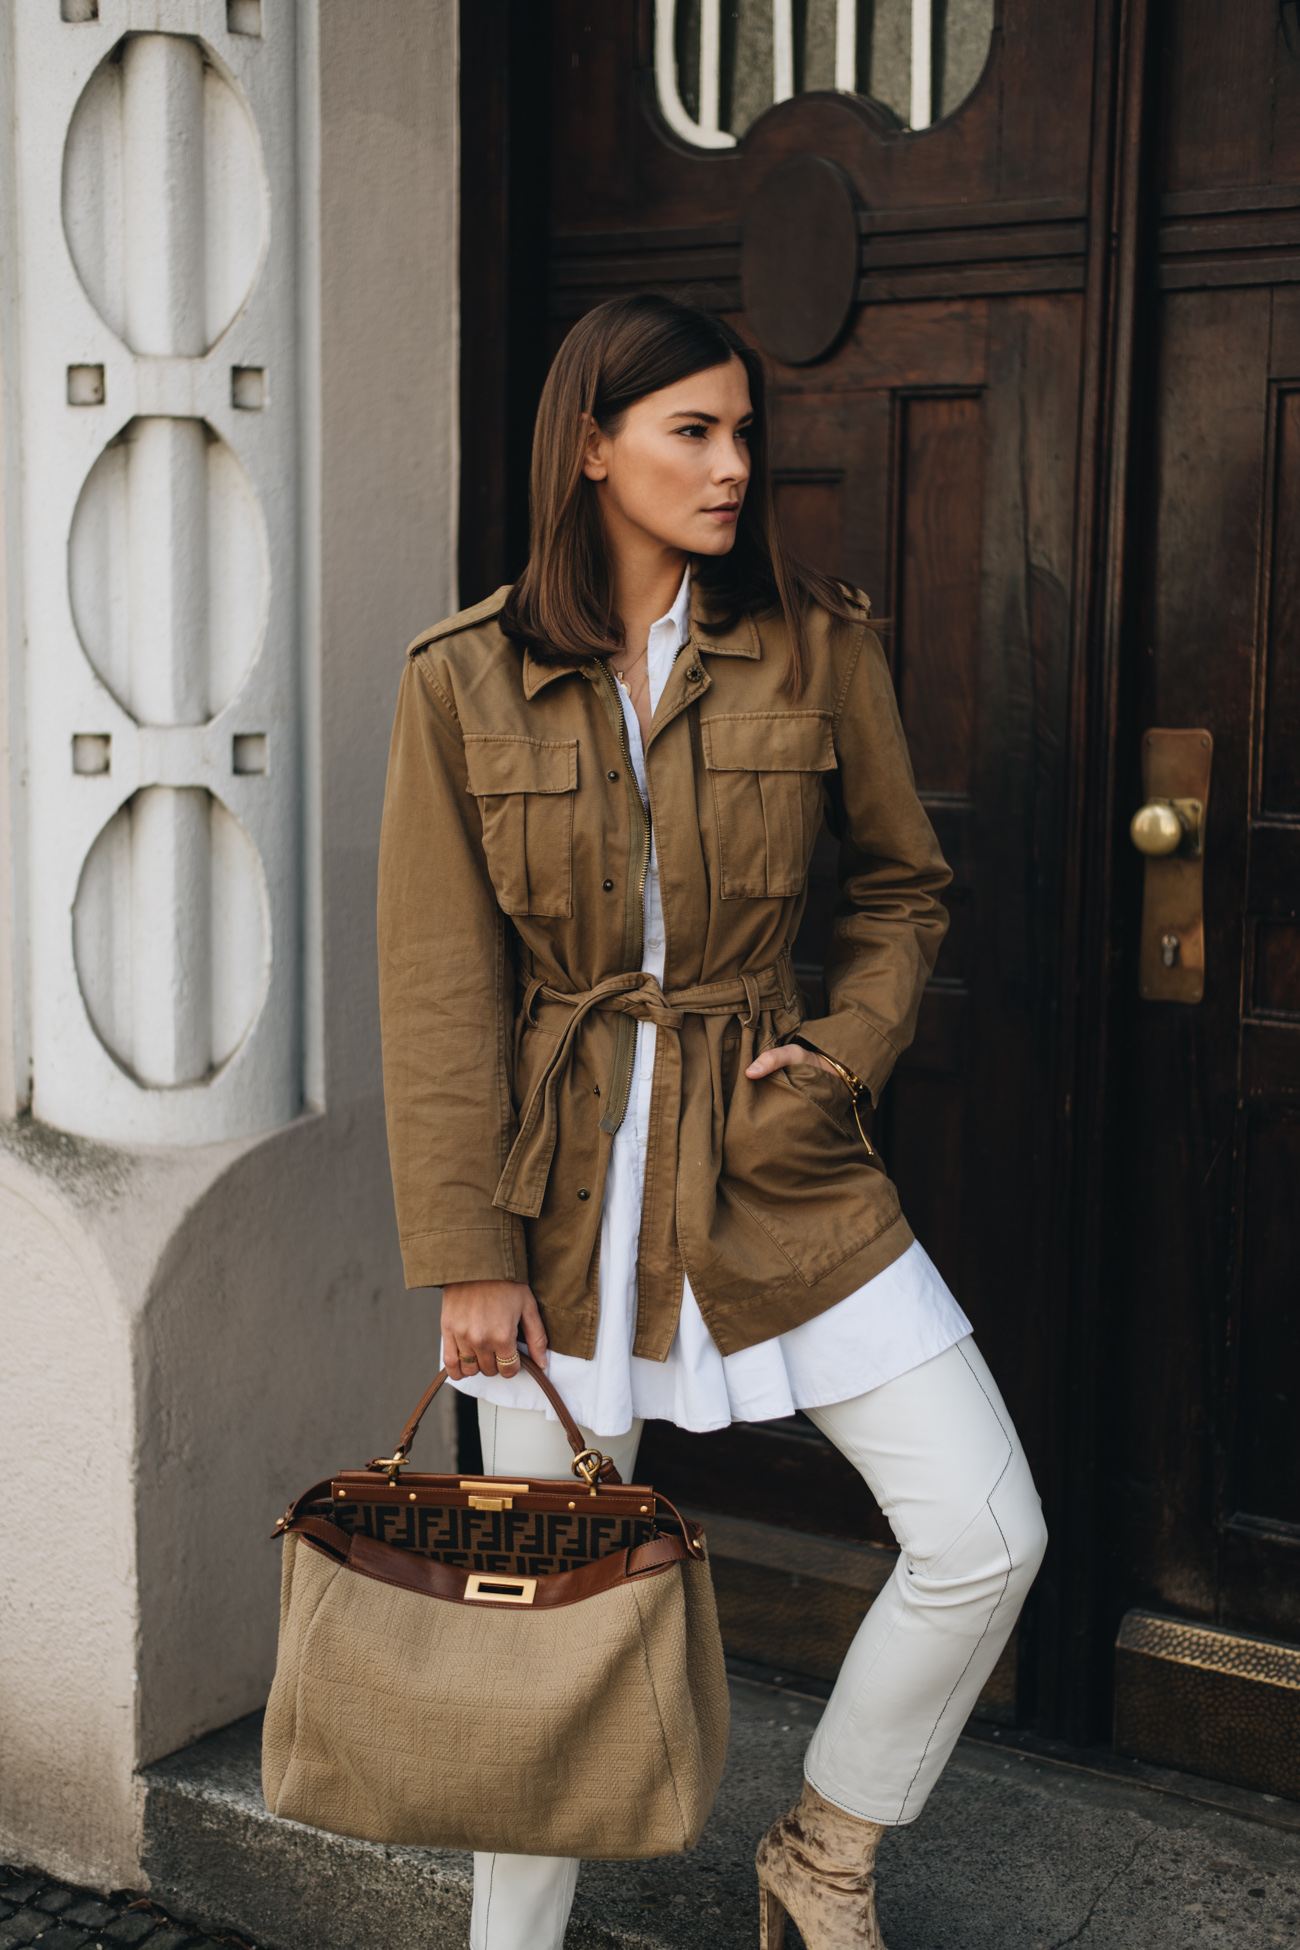 Nina Schwichtenberg trägt Frühlingsoutfit mit Parka, weißer lederhose und Fendi Peekaboo